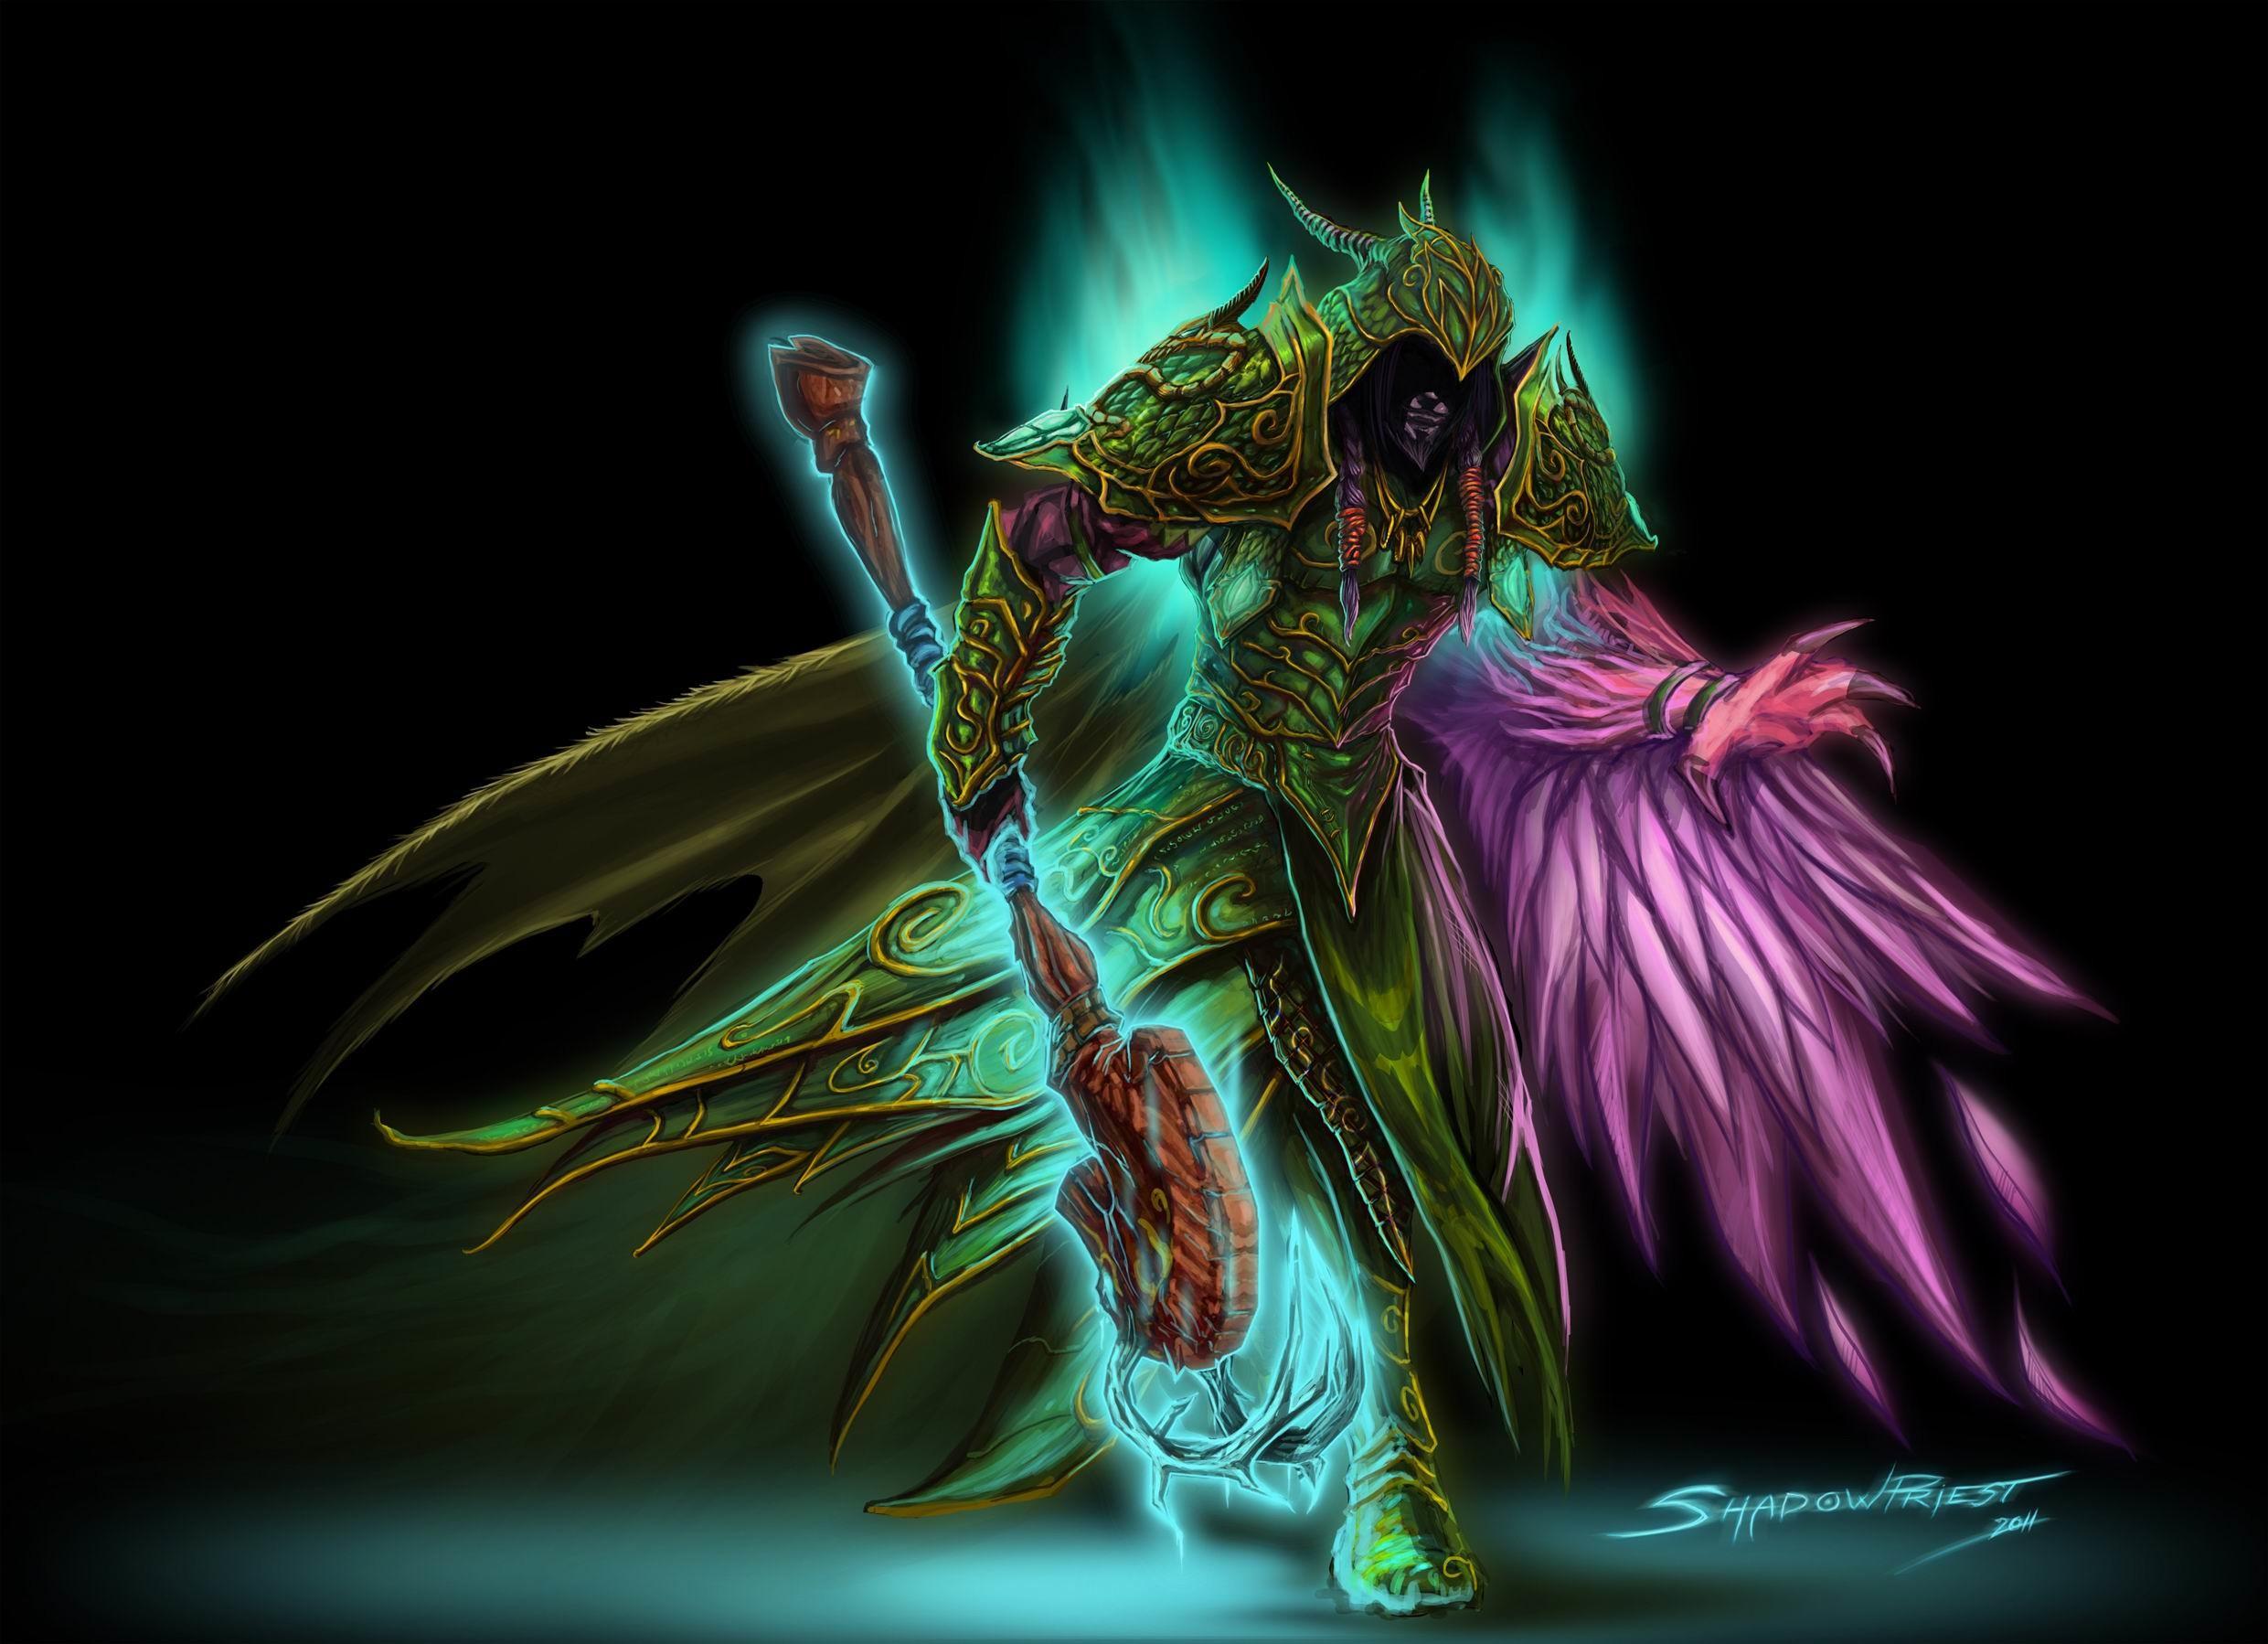 … World Of Warcraft Wallpaper Druid (04) …